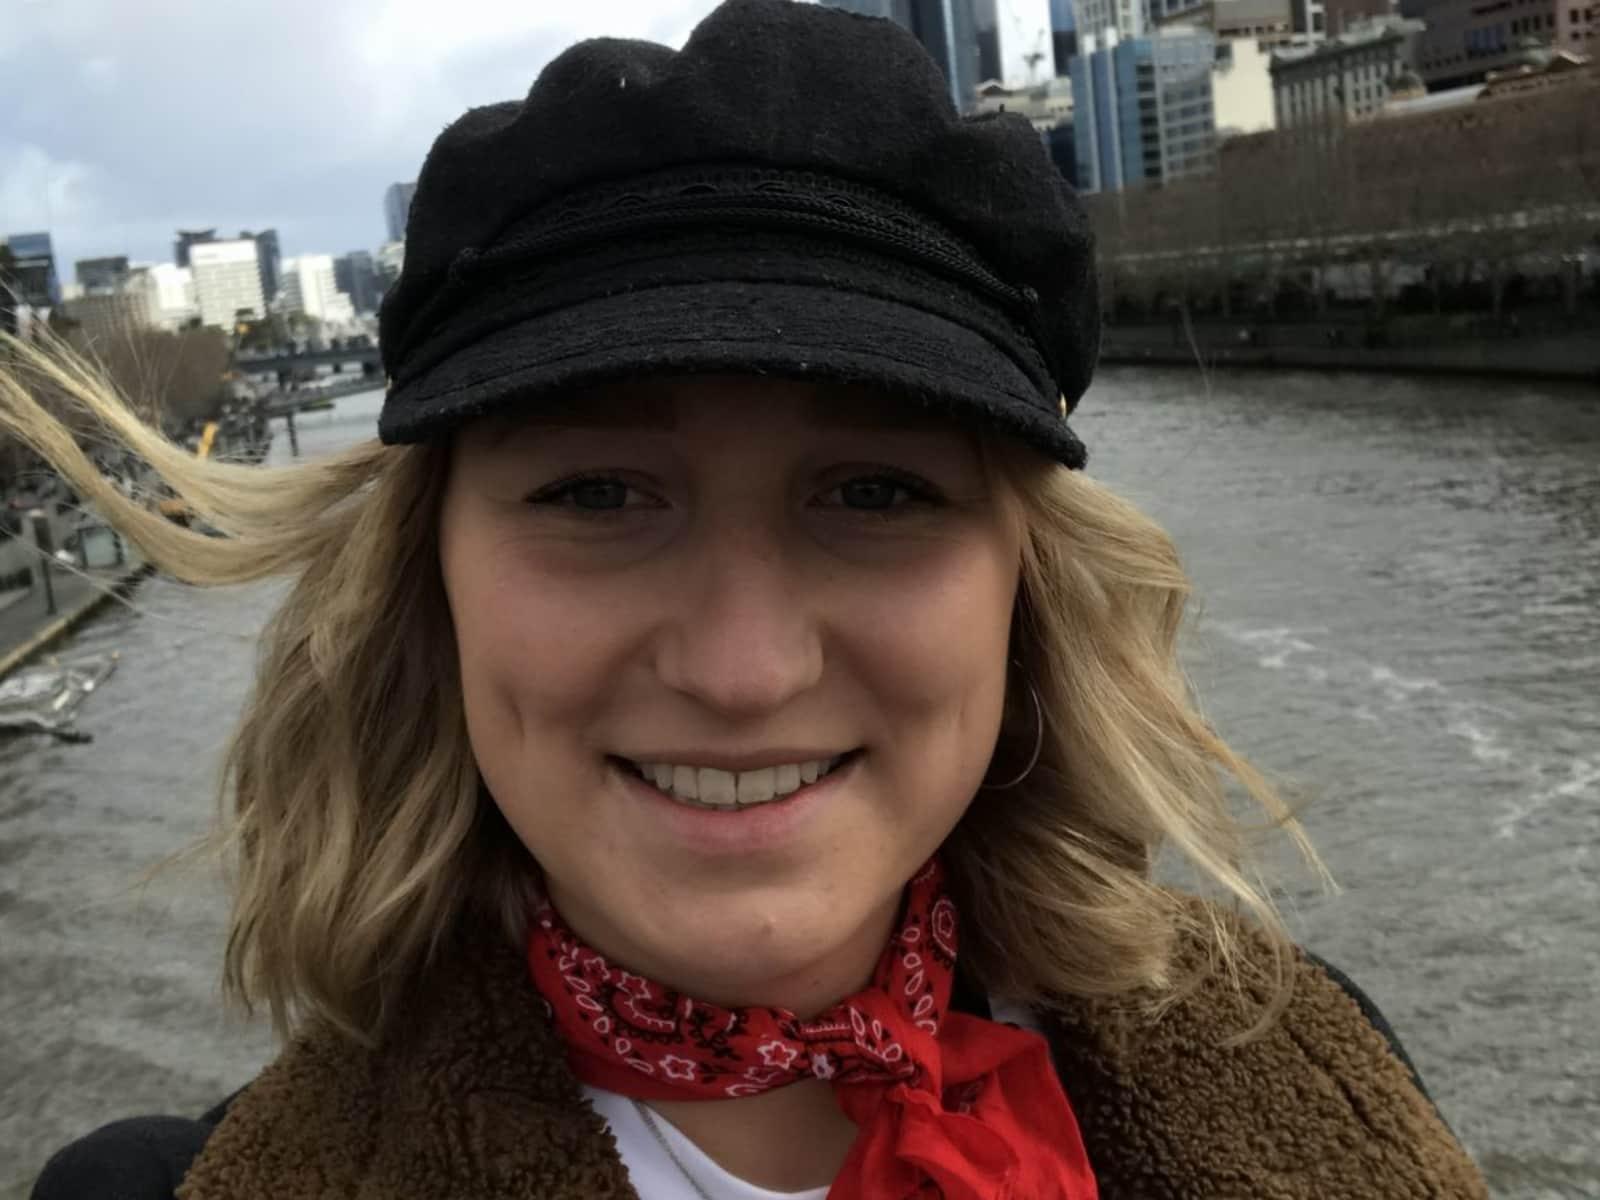 Nadja from Melbourne, Victoria, Australia